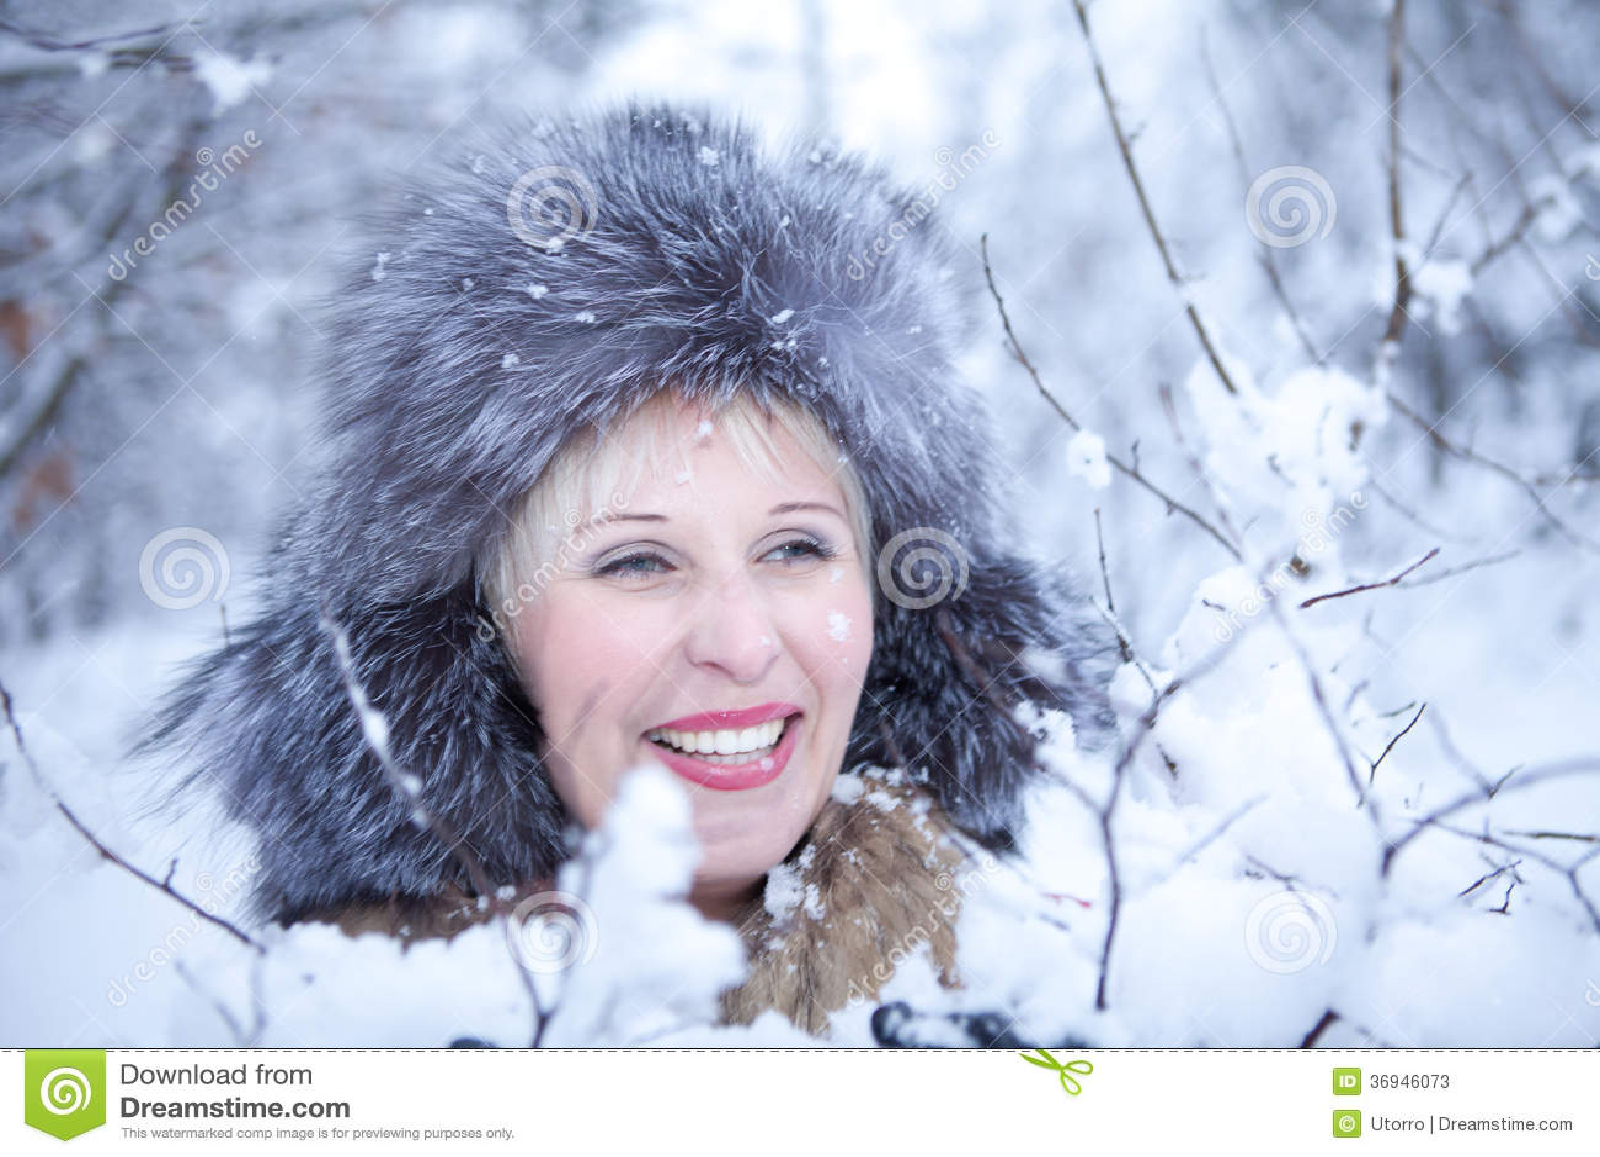 in winter fur - photo #11